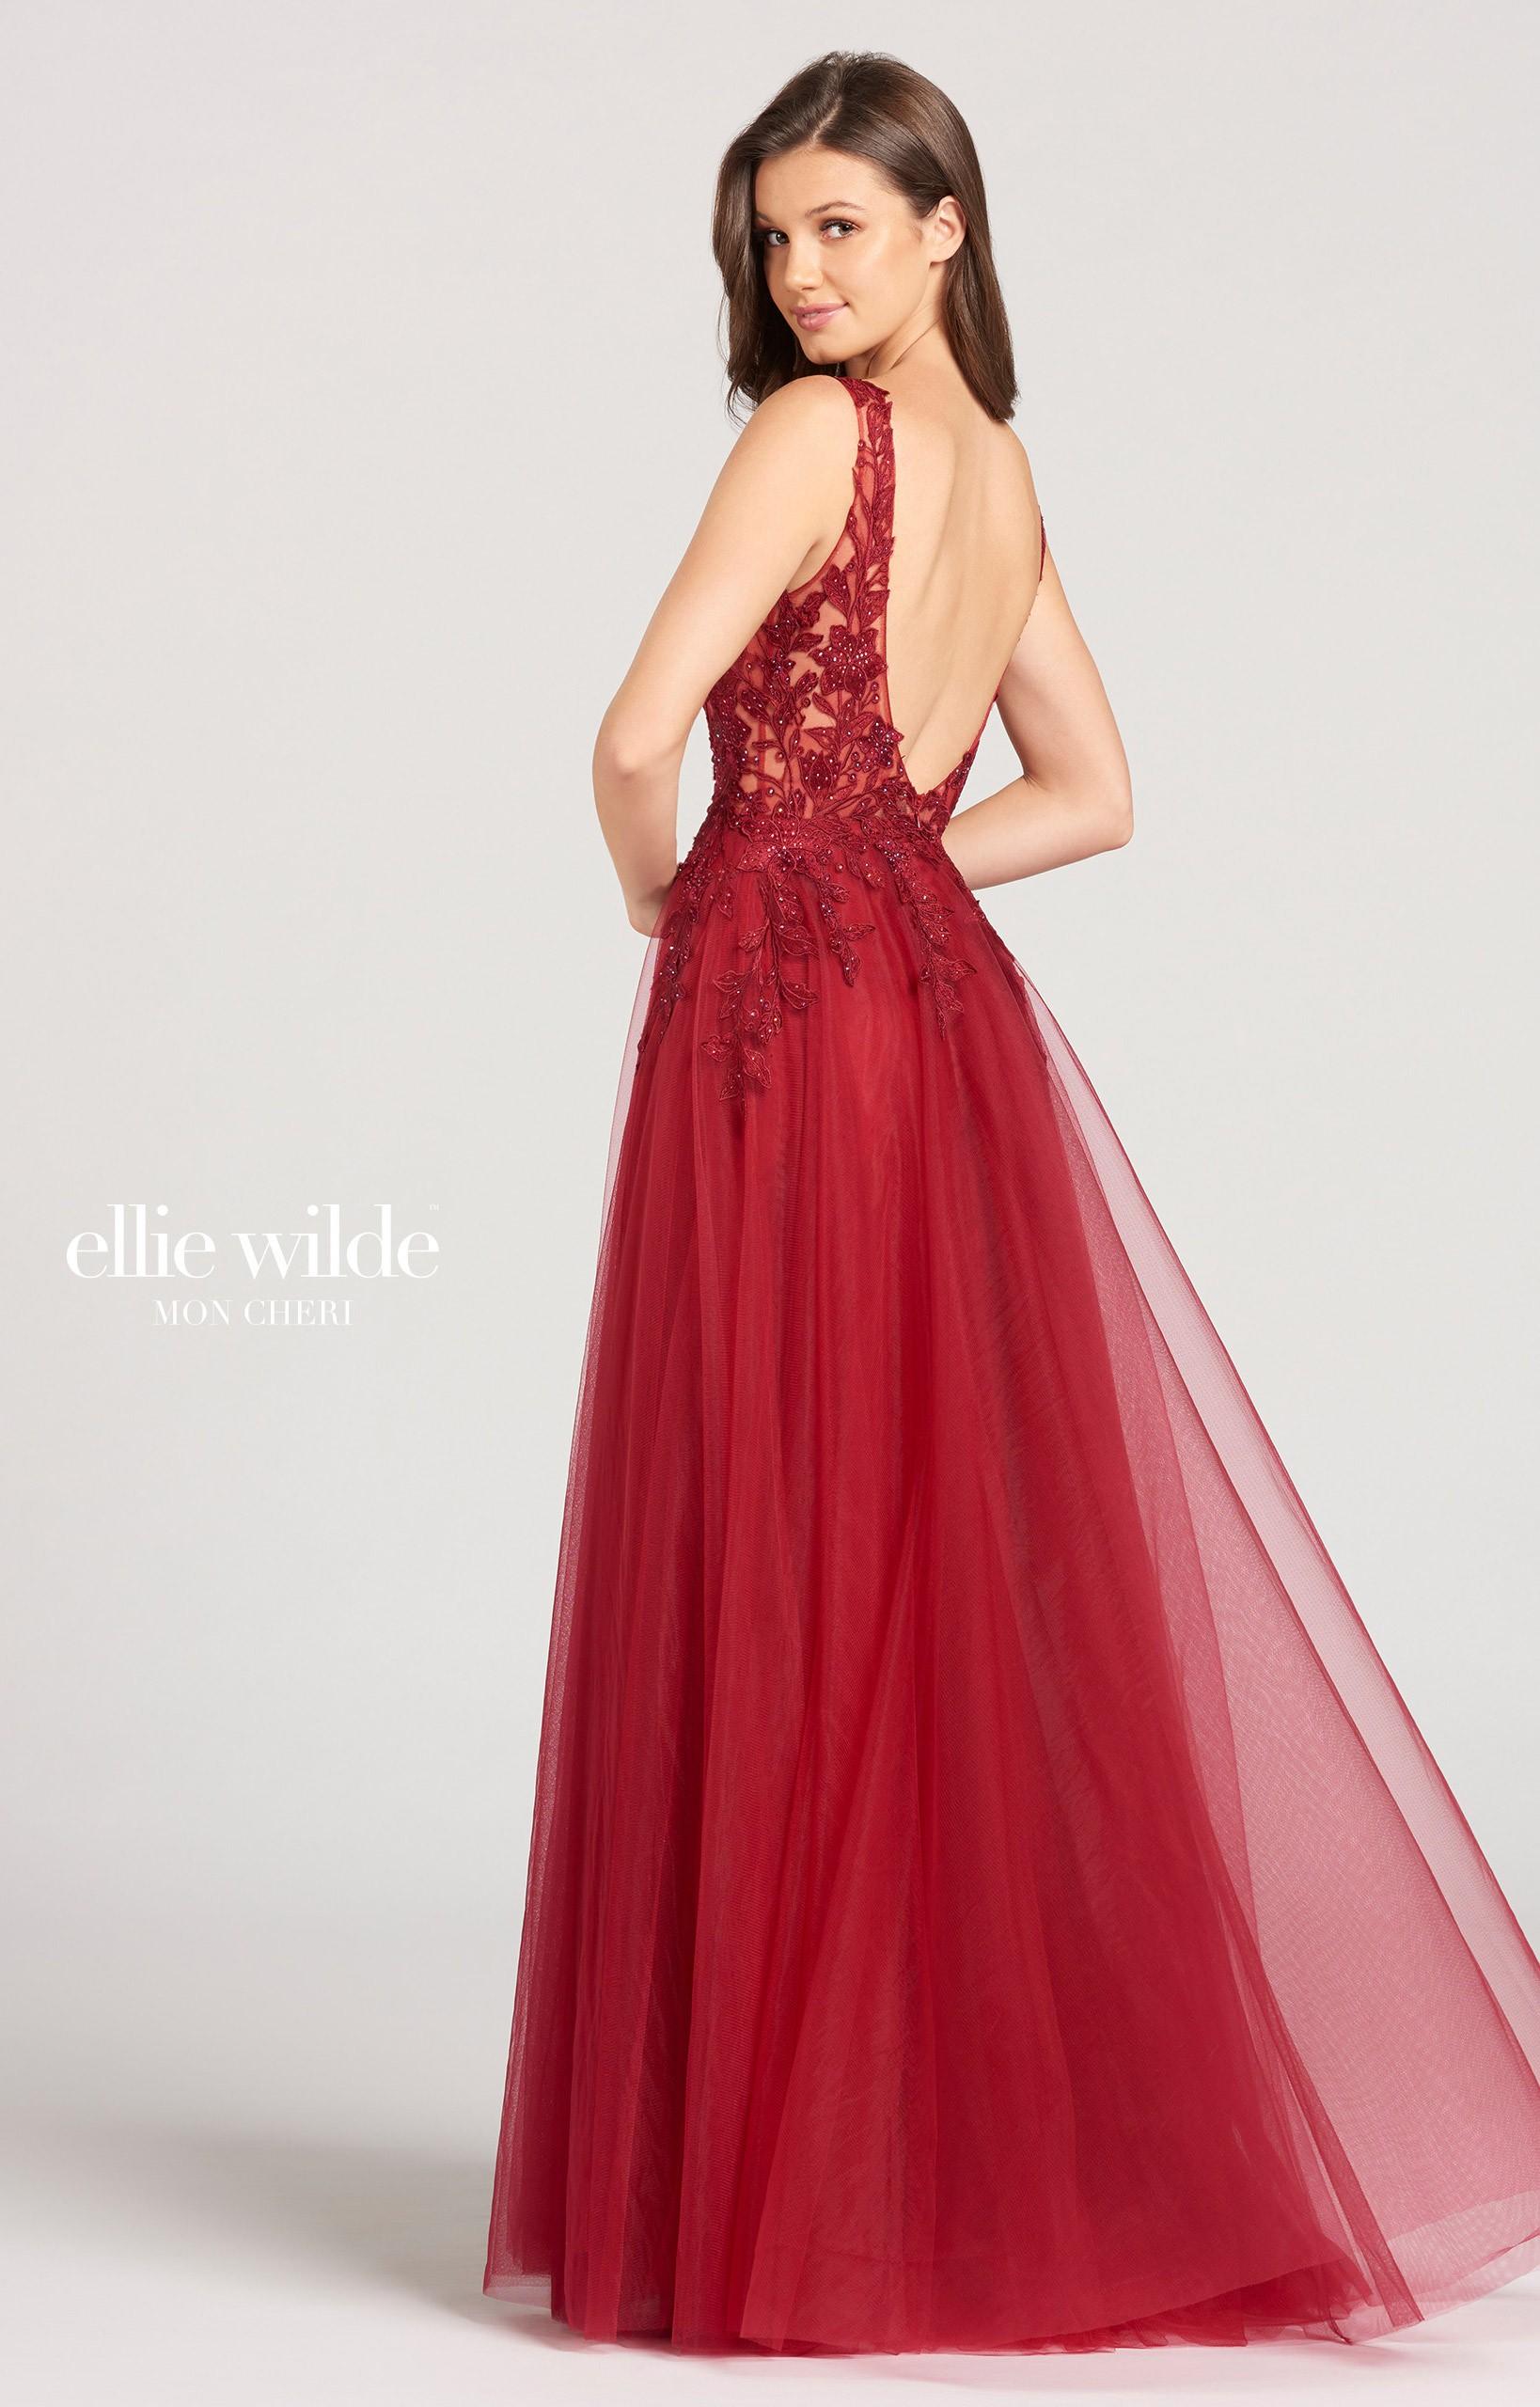 Ellie Wilde Ew118139 V Neckline High Slit Tulle Evening